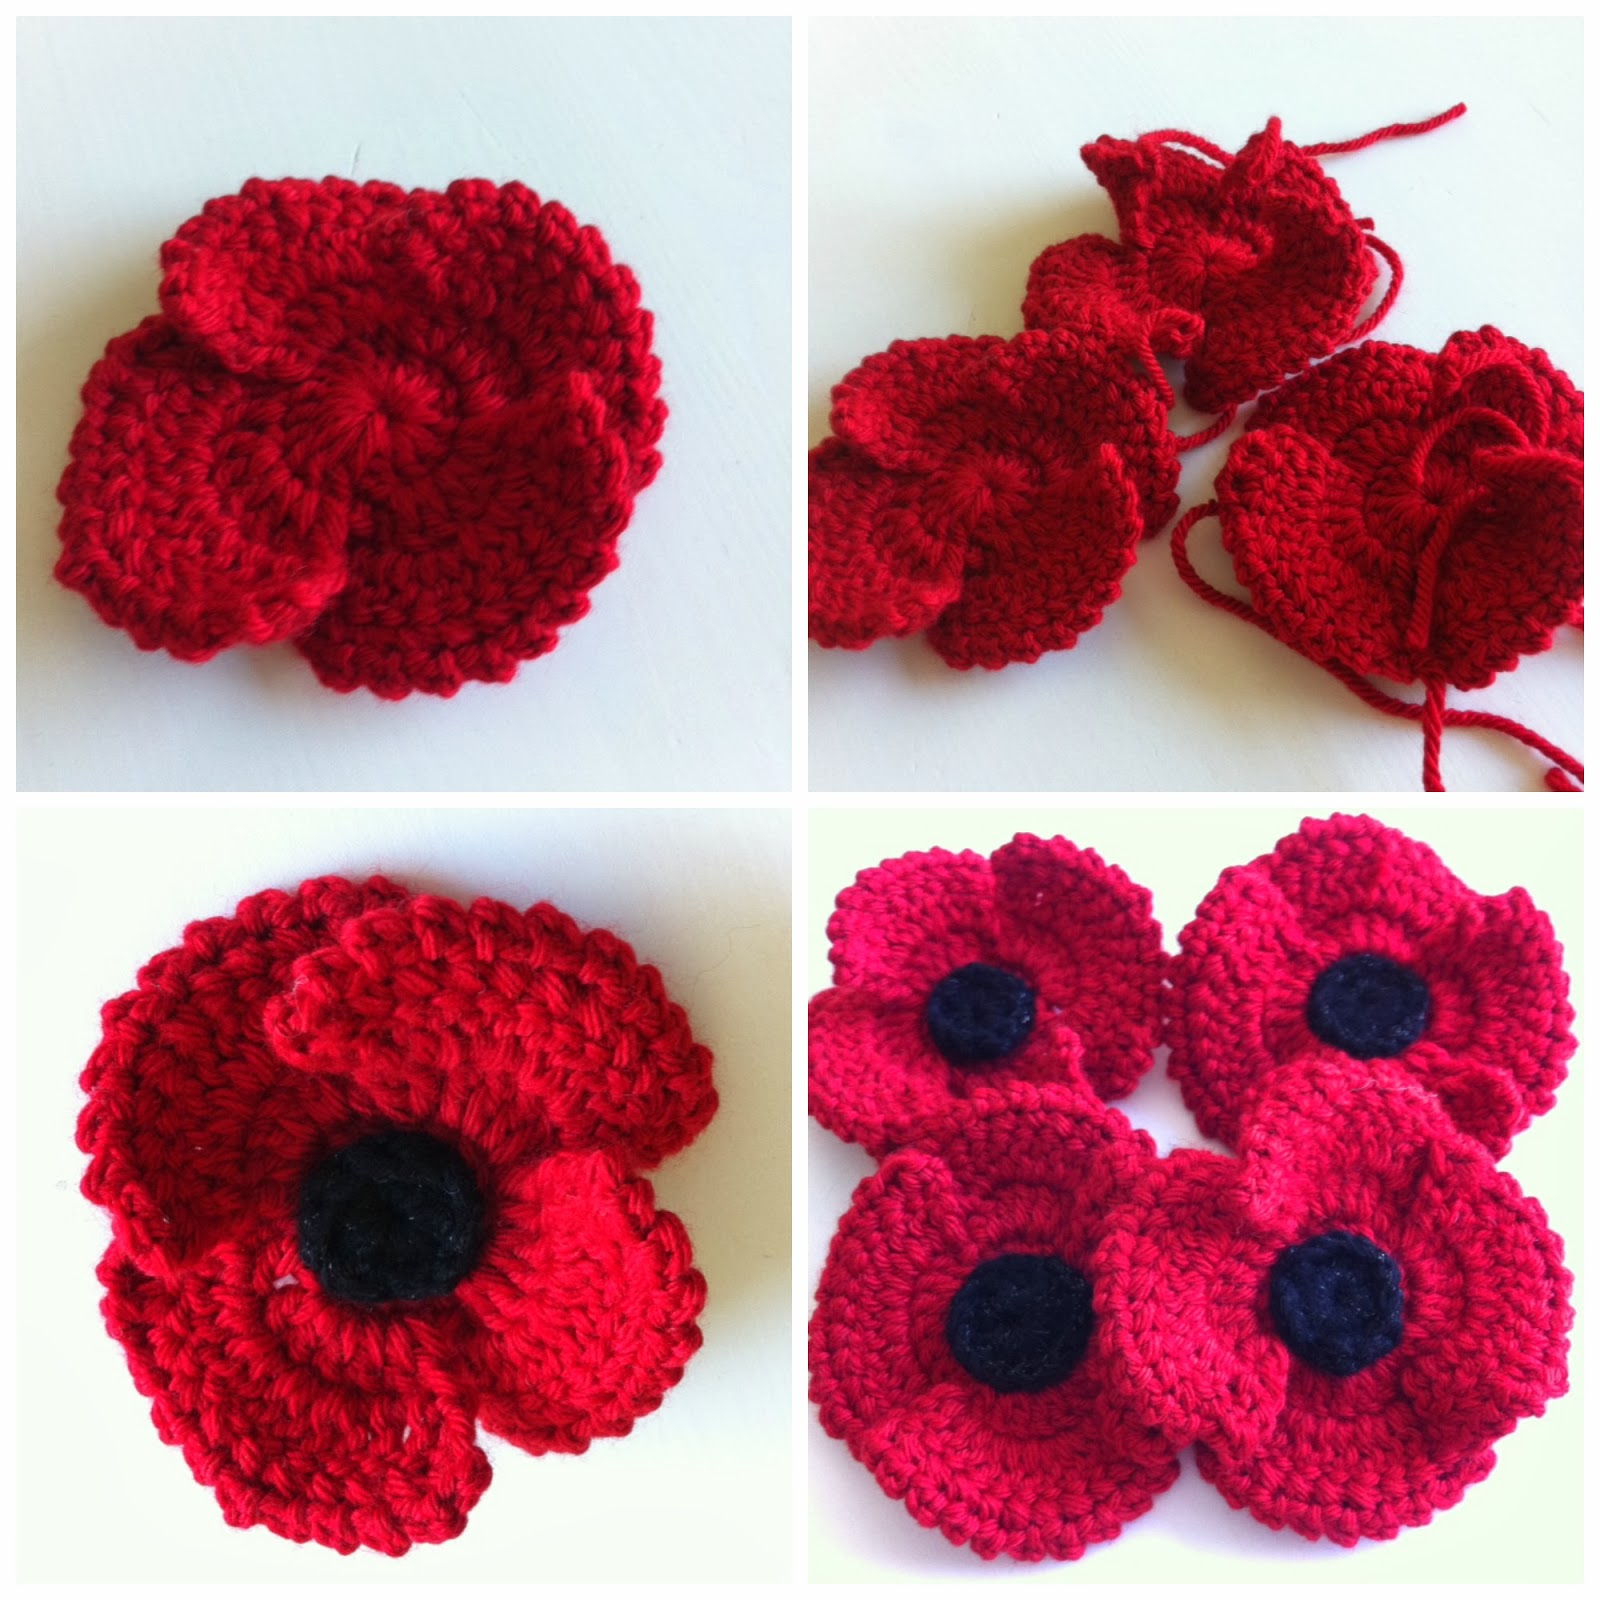 crochet along............................